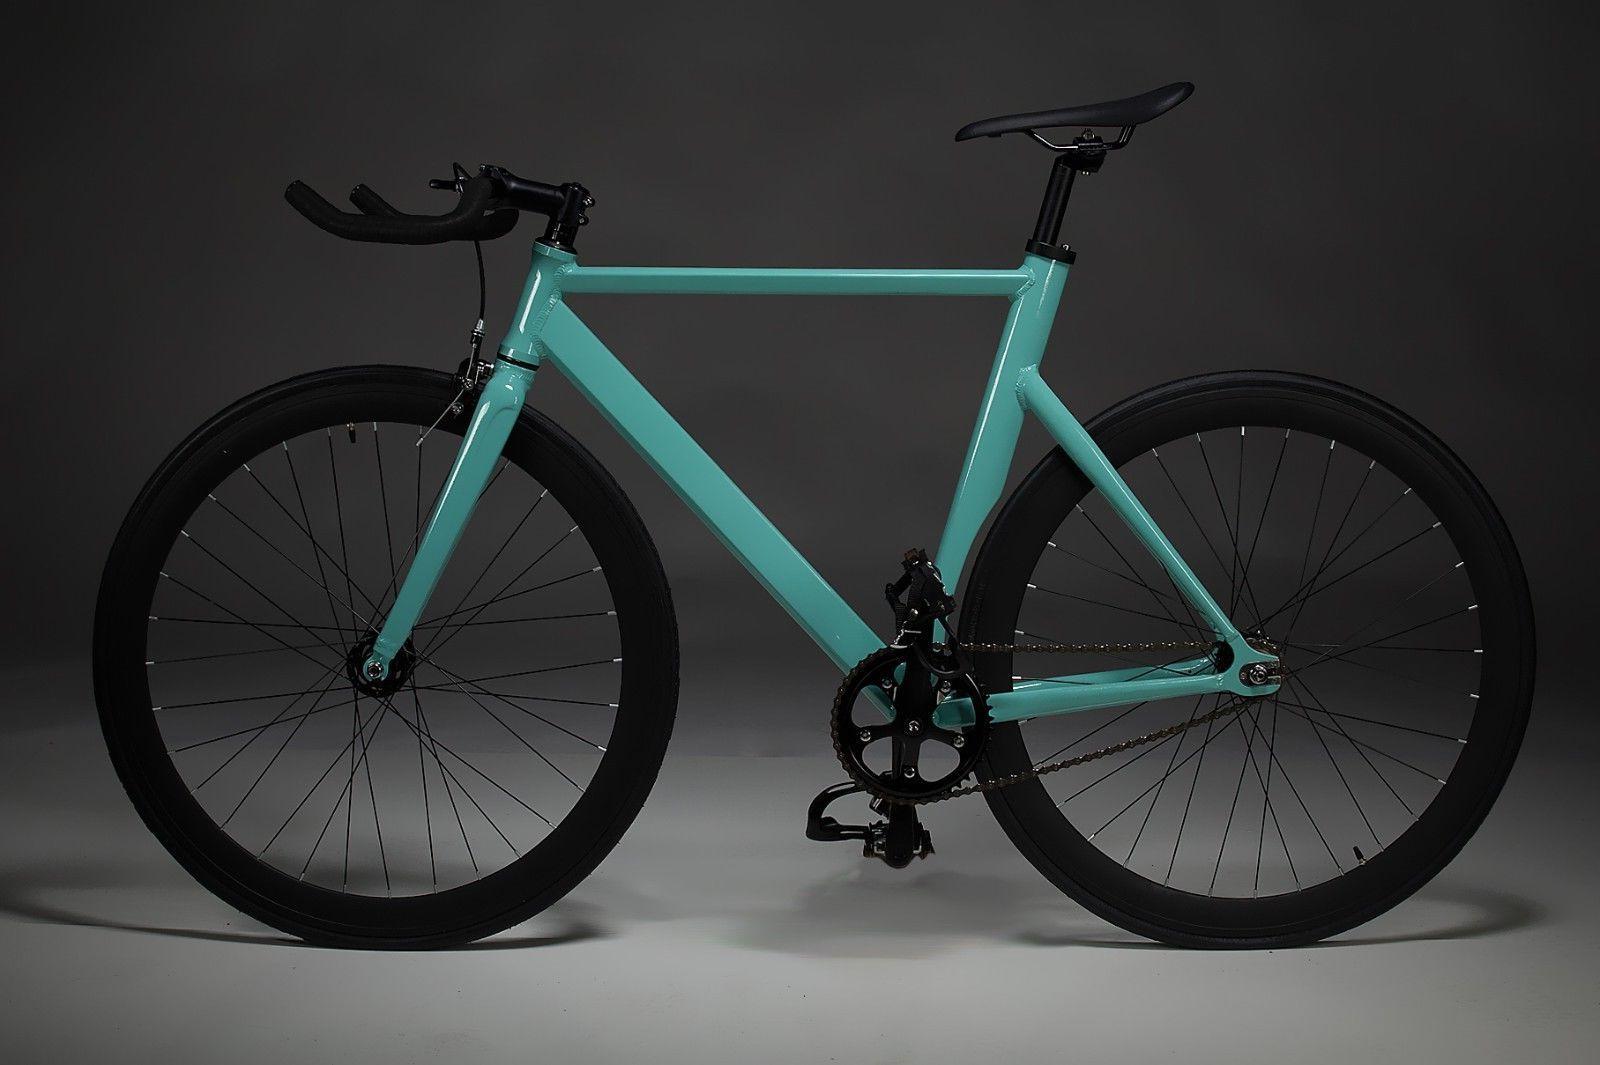 veloce bike co icarus v1 fixed gear